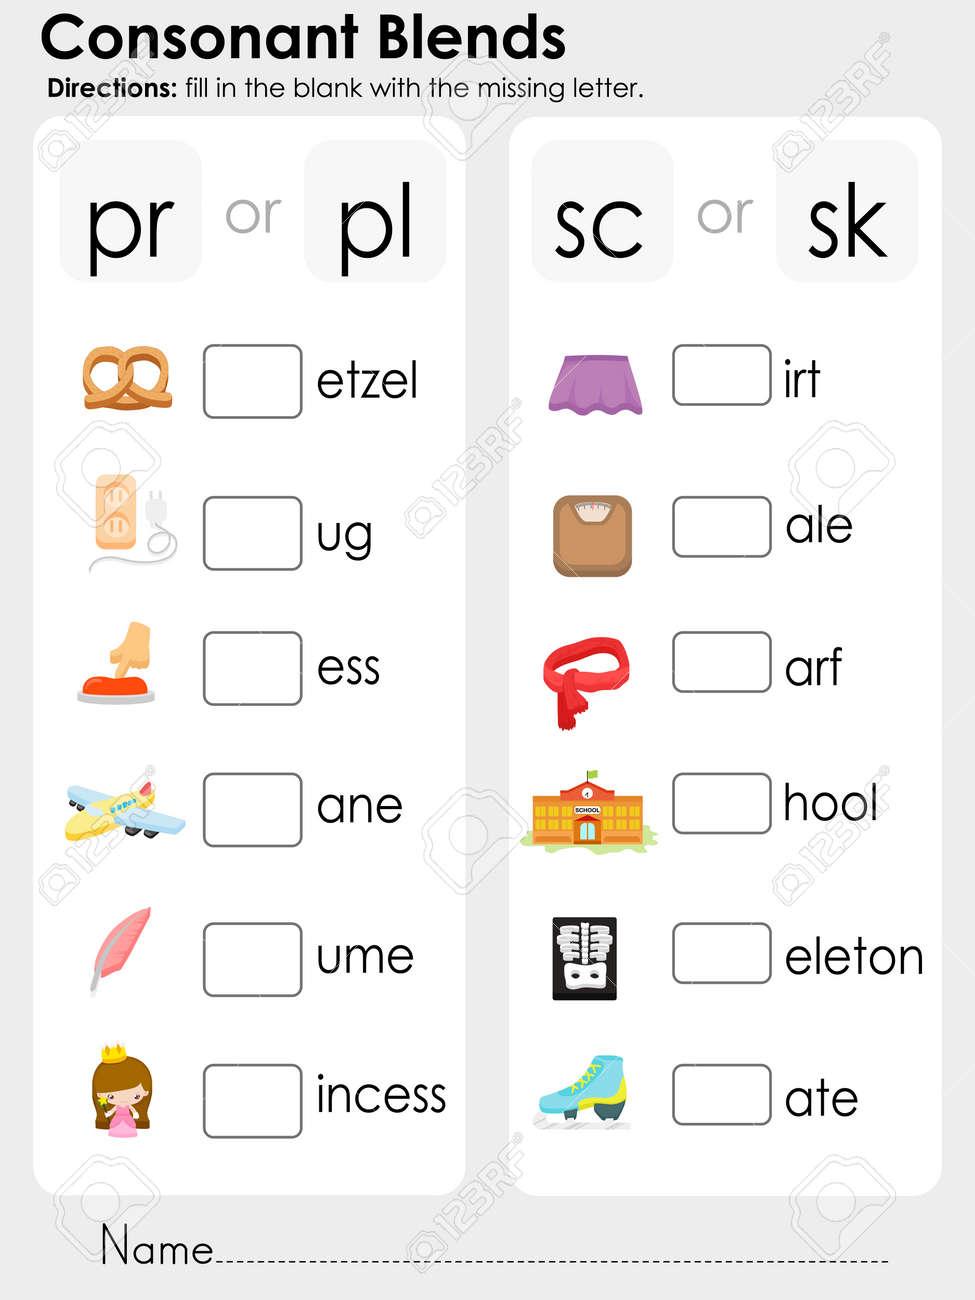 Worksheets Consonant Blend Worksheets consonant blends fill in the blank with missing letter worksheet for education stock